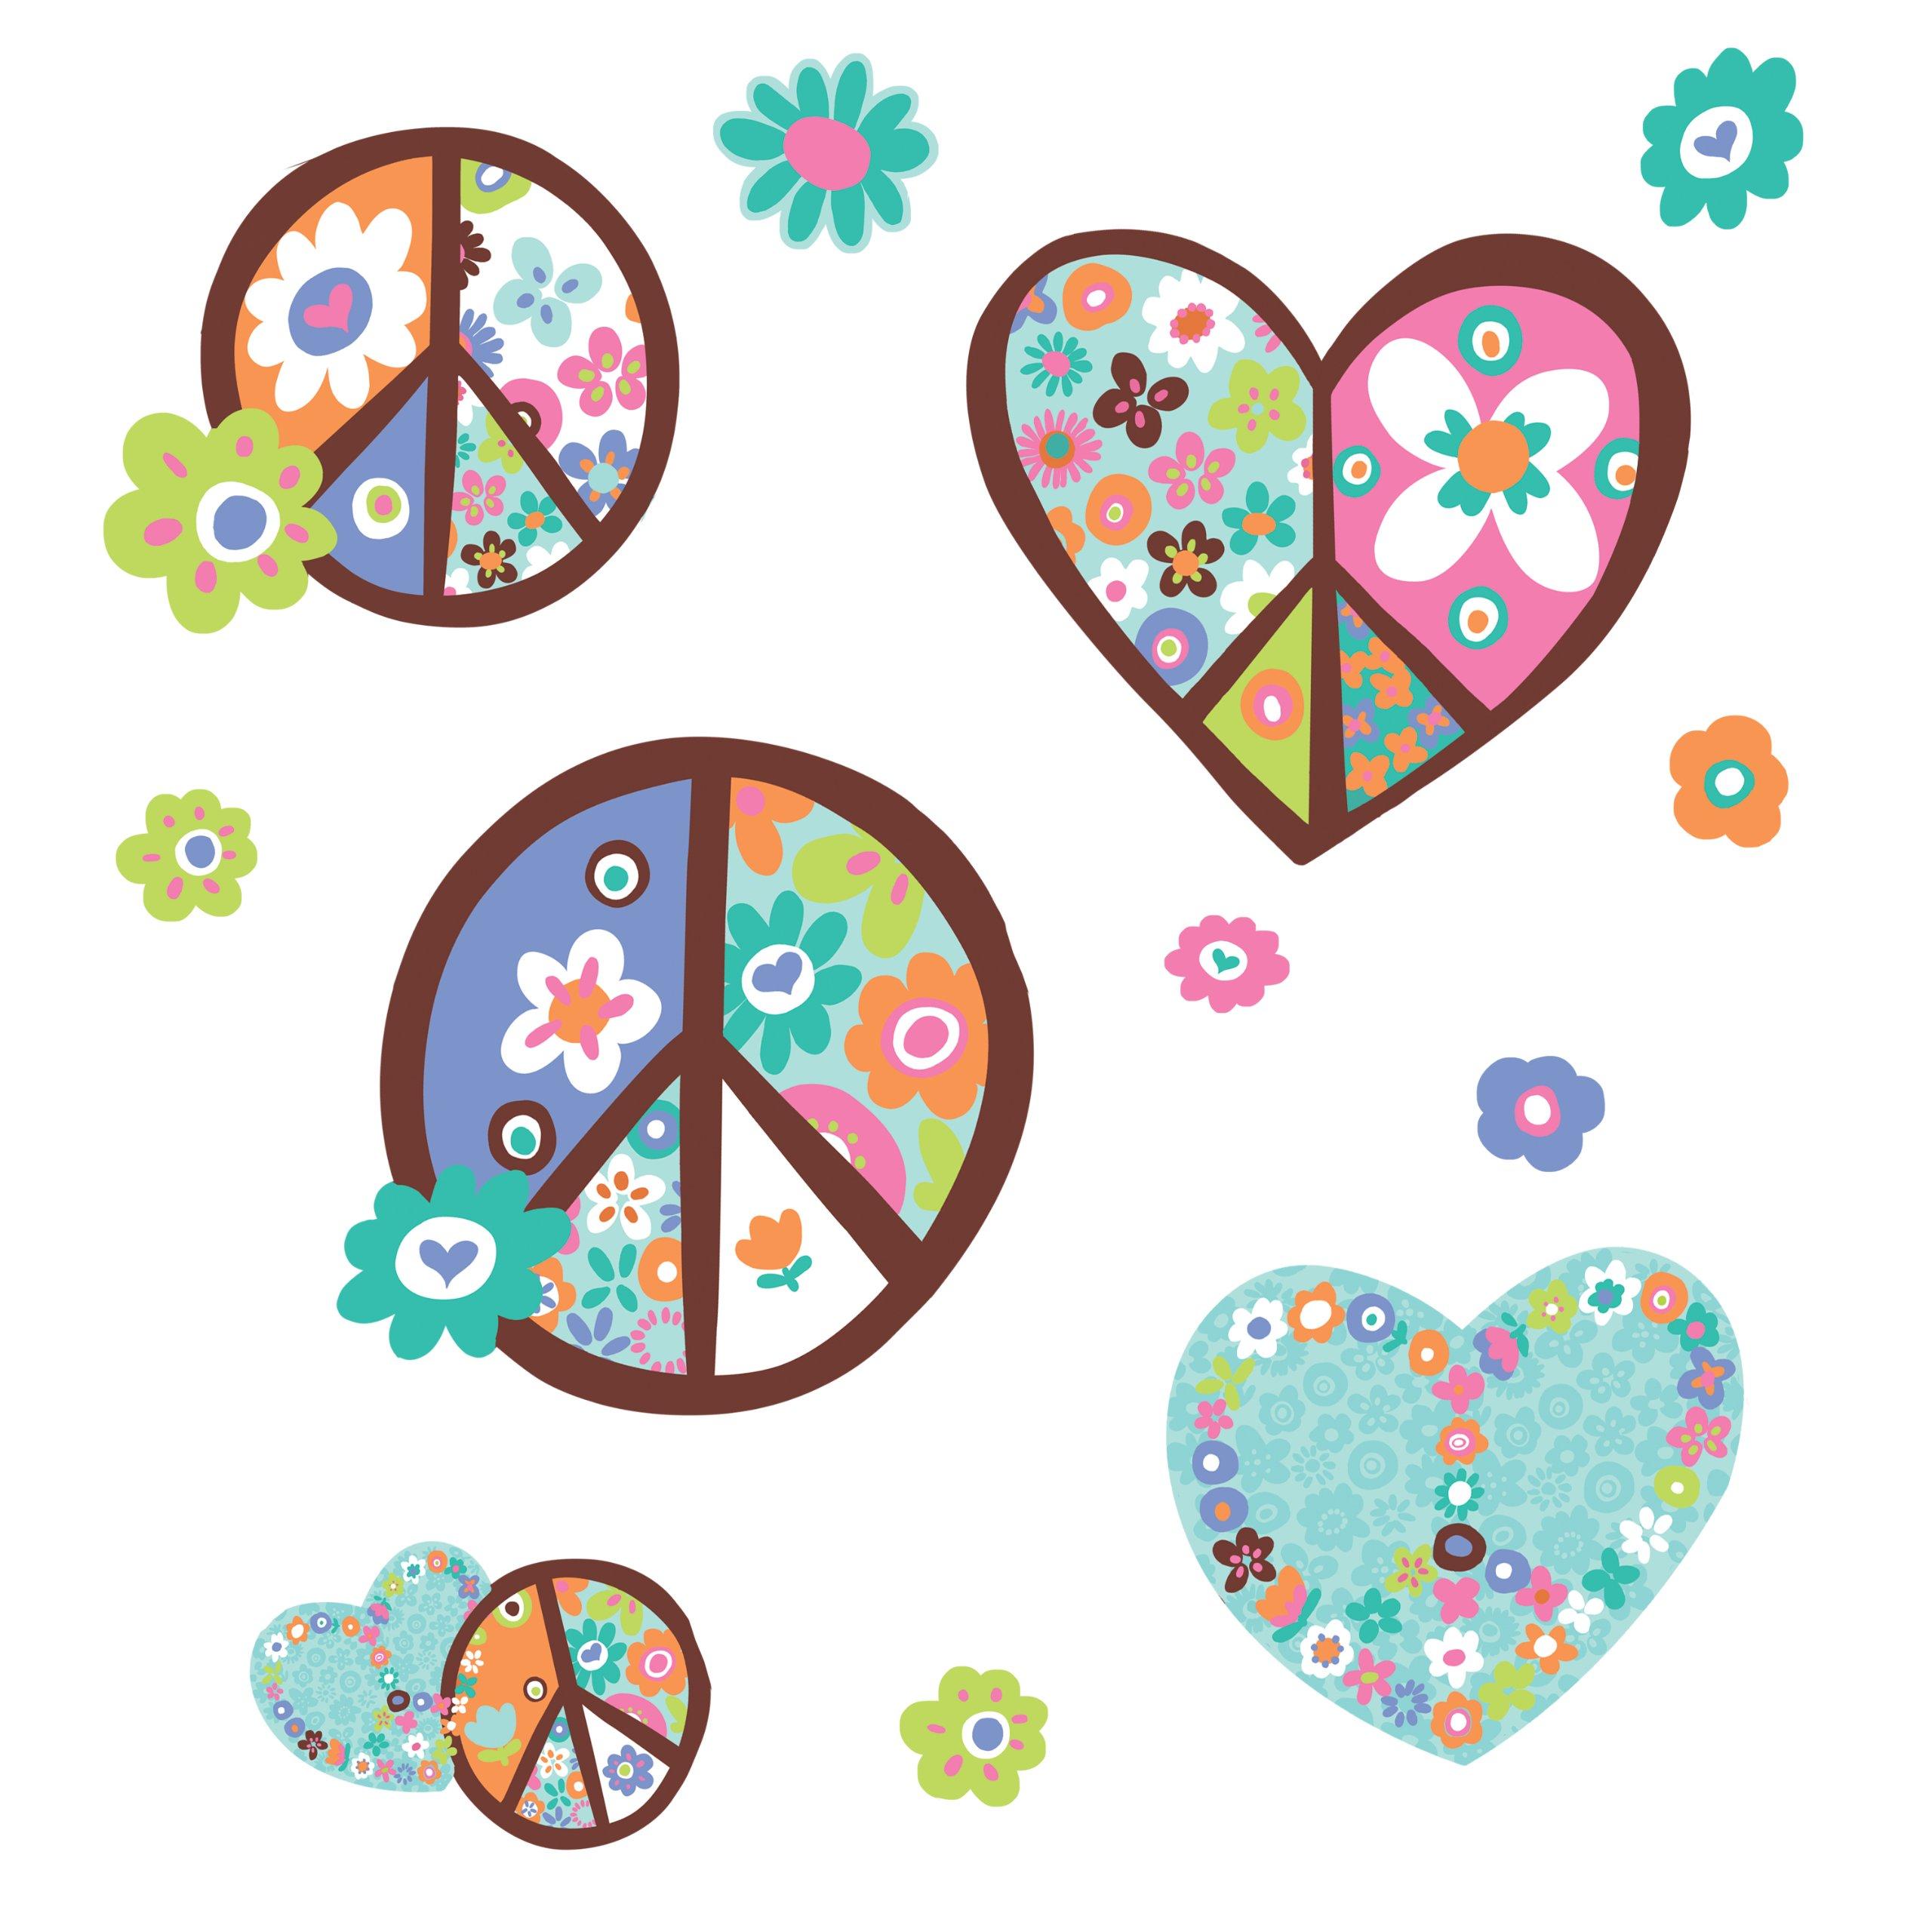 Vinilo Decorativo Pared  simbolo corazones flores paz